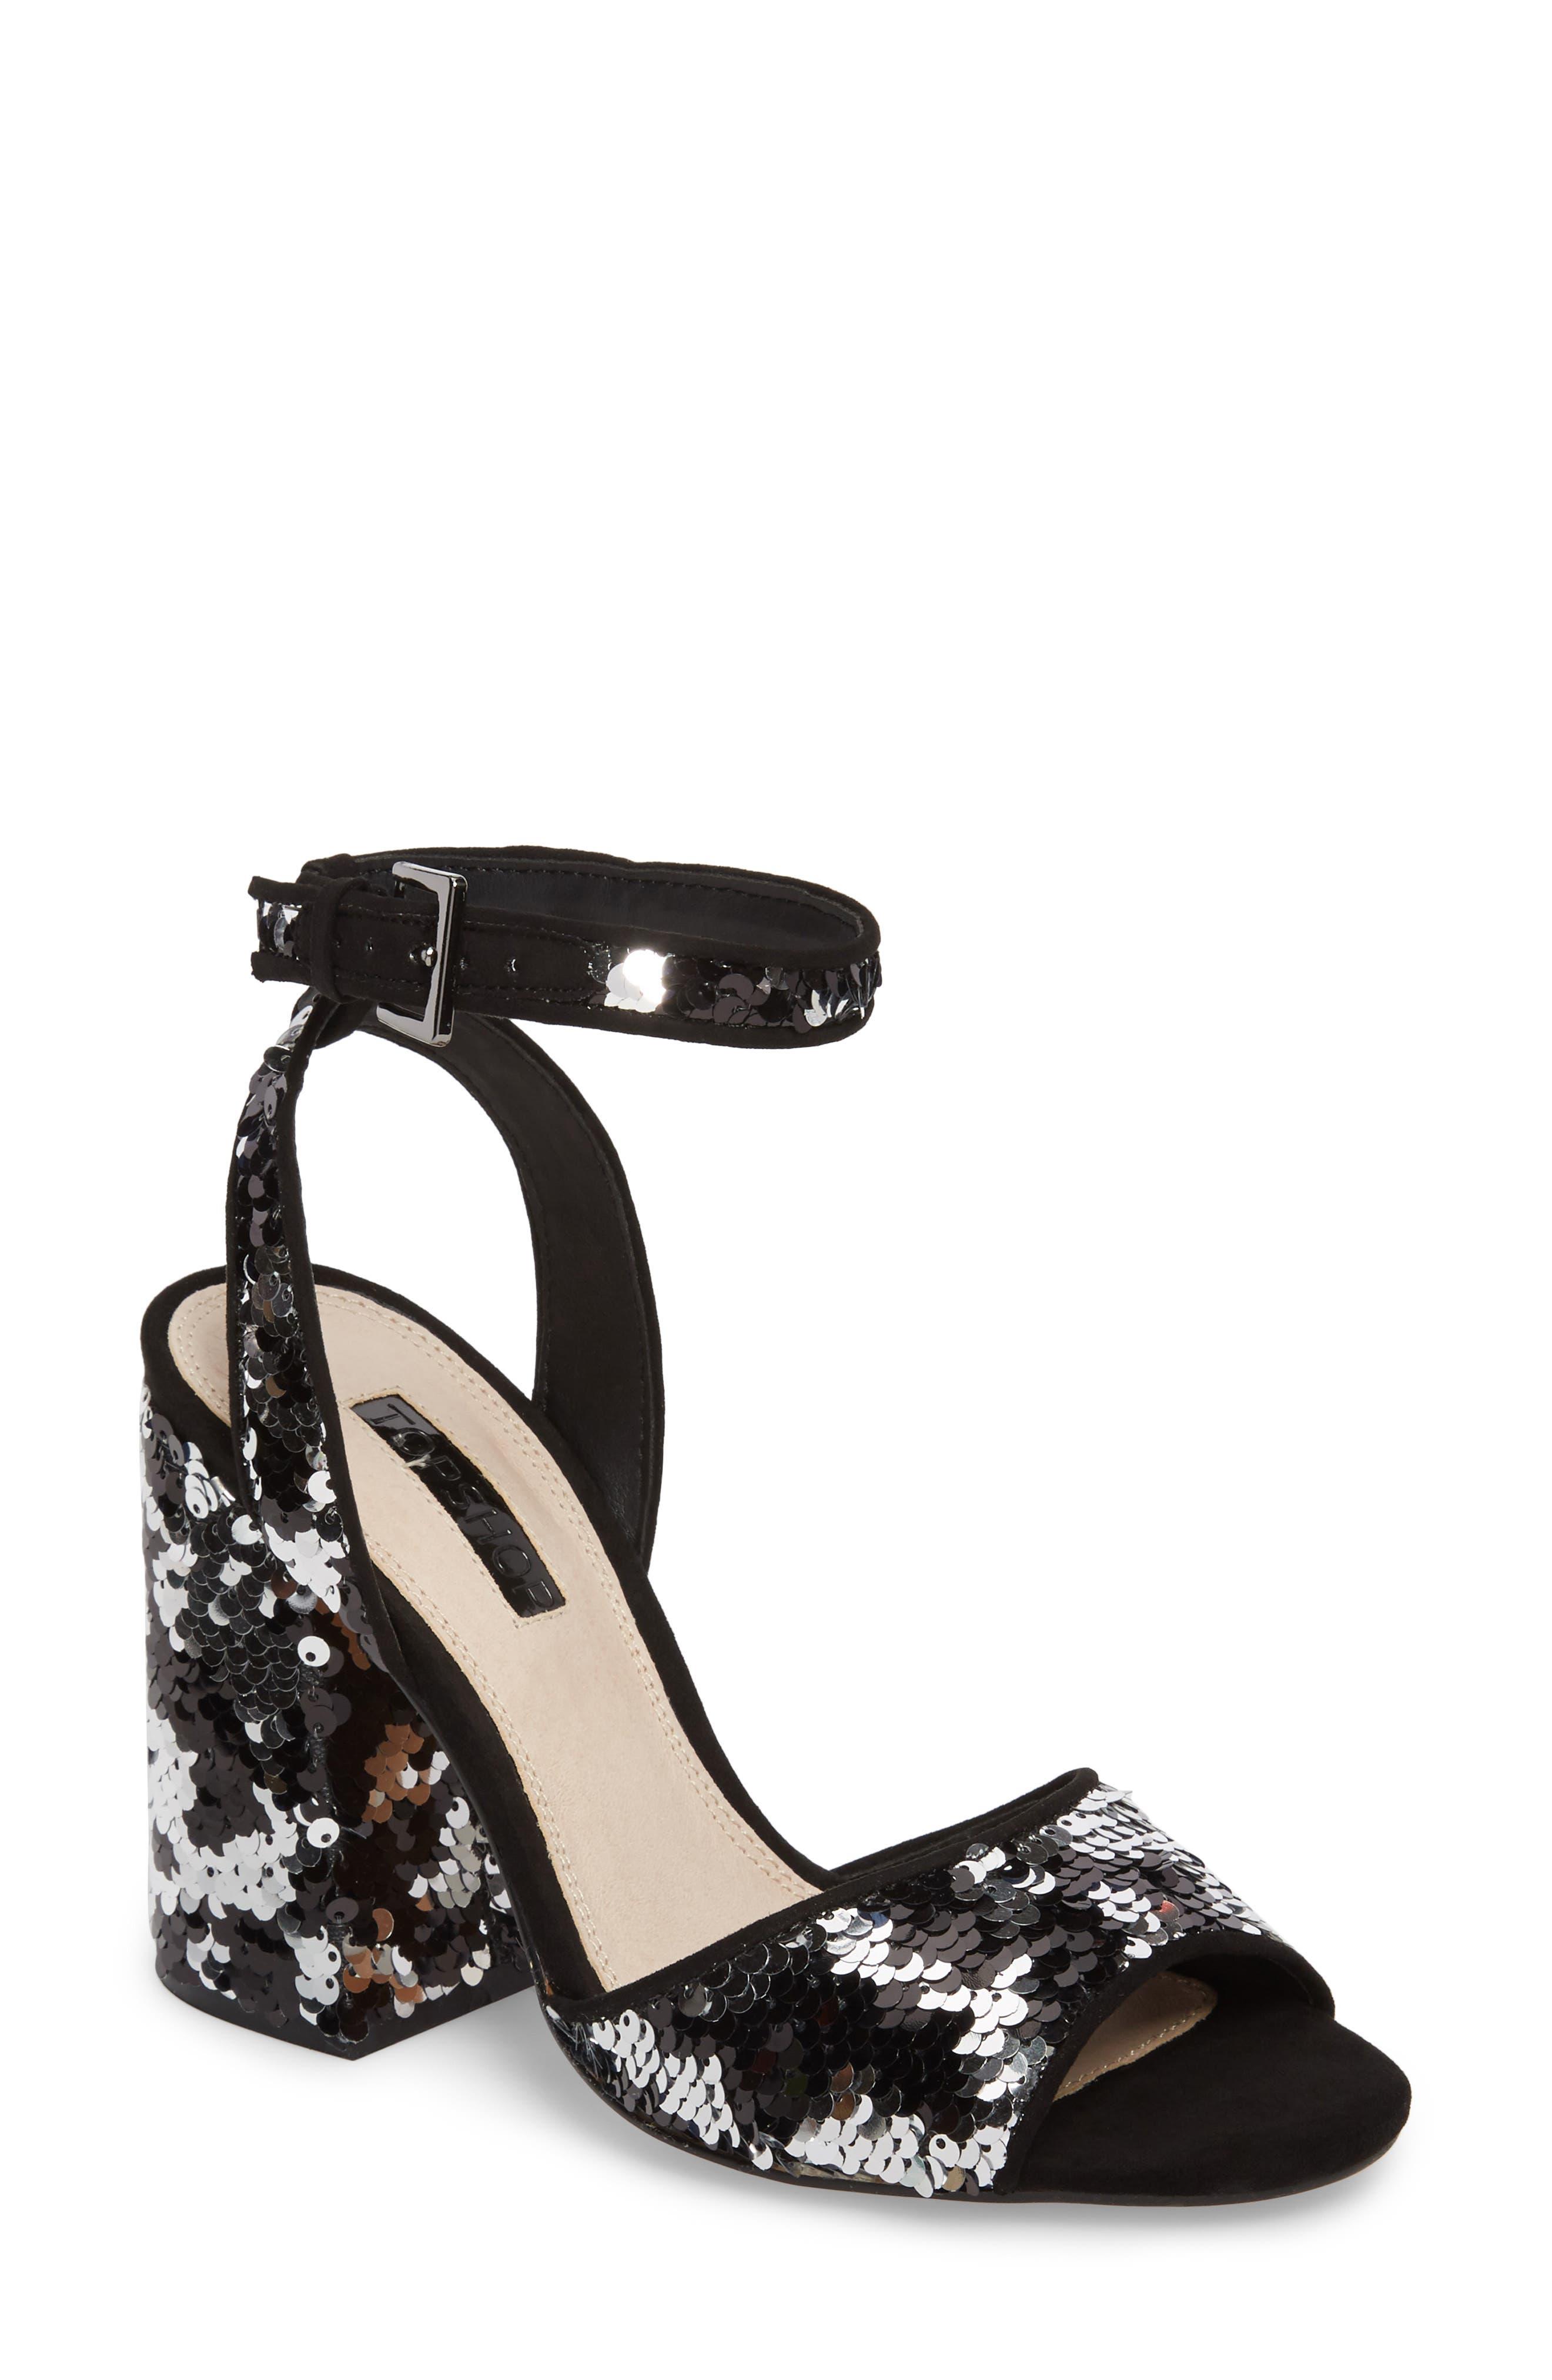 Reaction Sequin Block Heel Sandal,                         Main,                         color, Black Multi